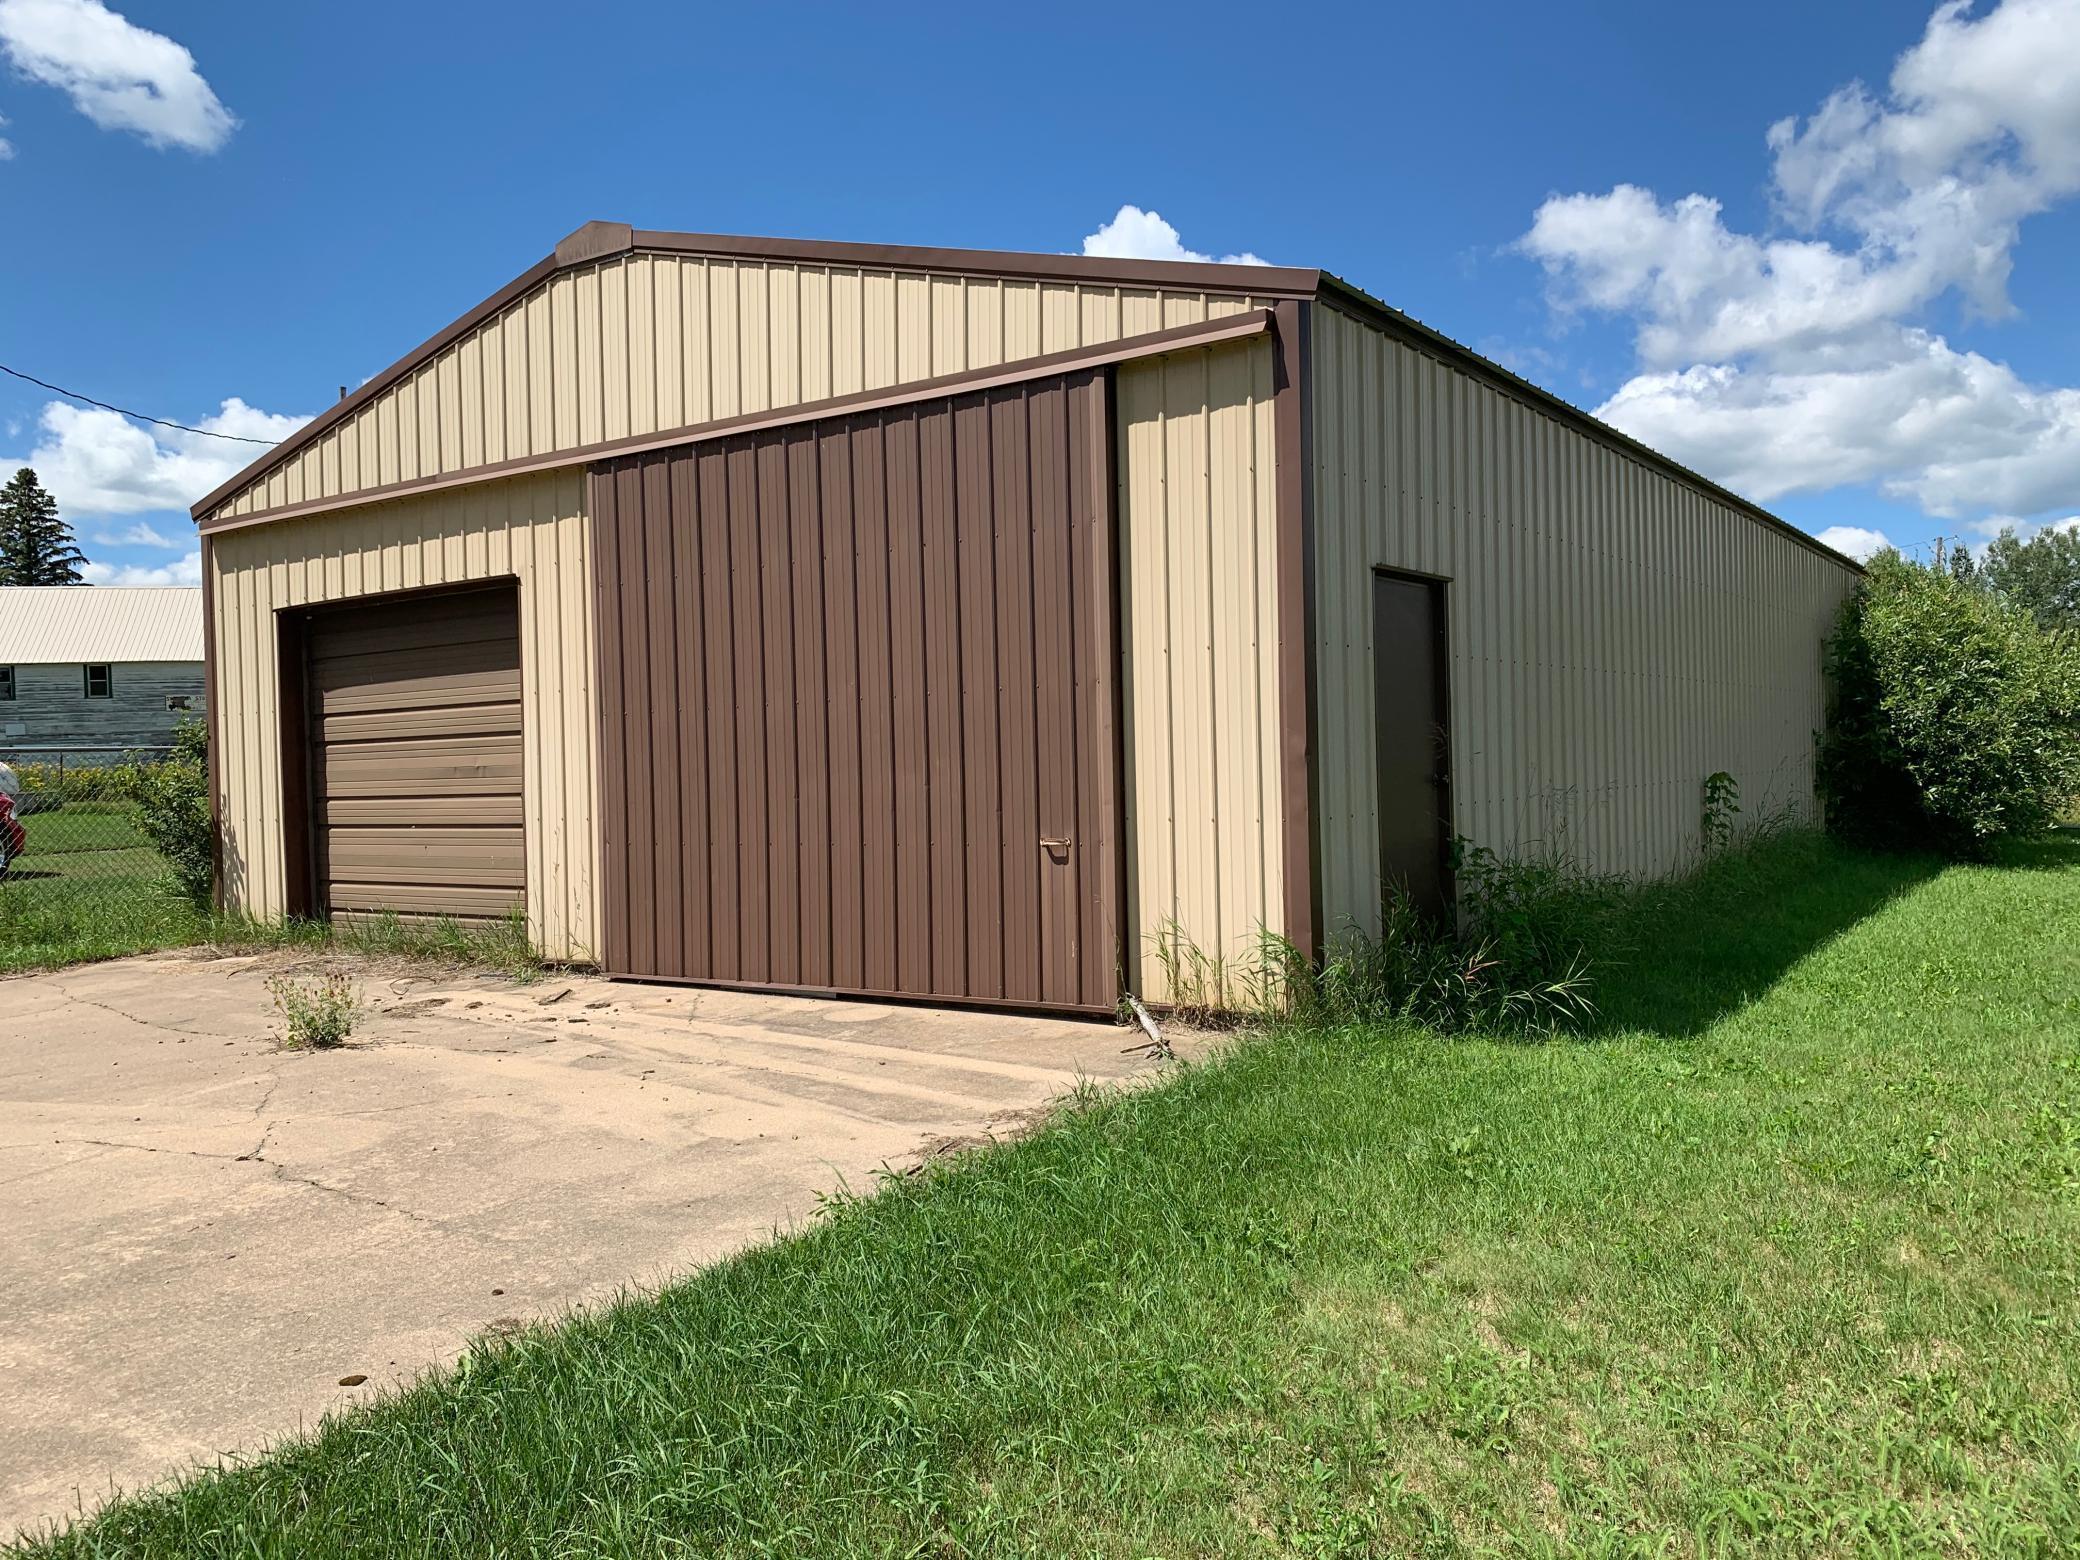 38819 610th Street Property Photo - Swatara, MN real estate listing